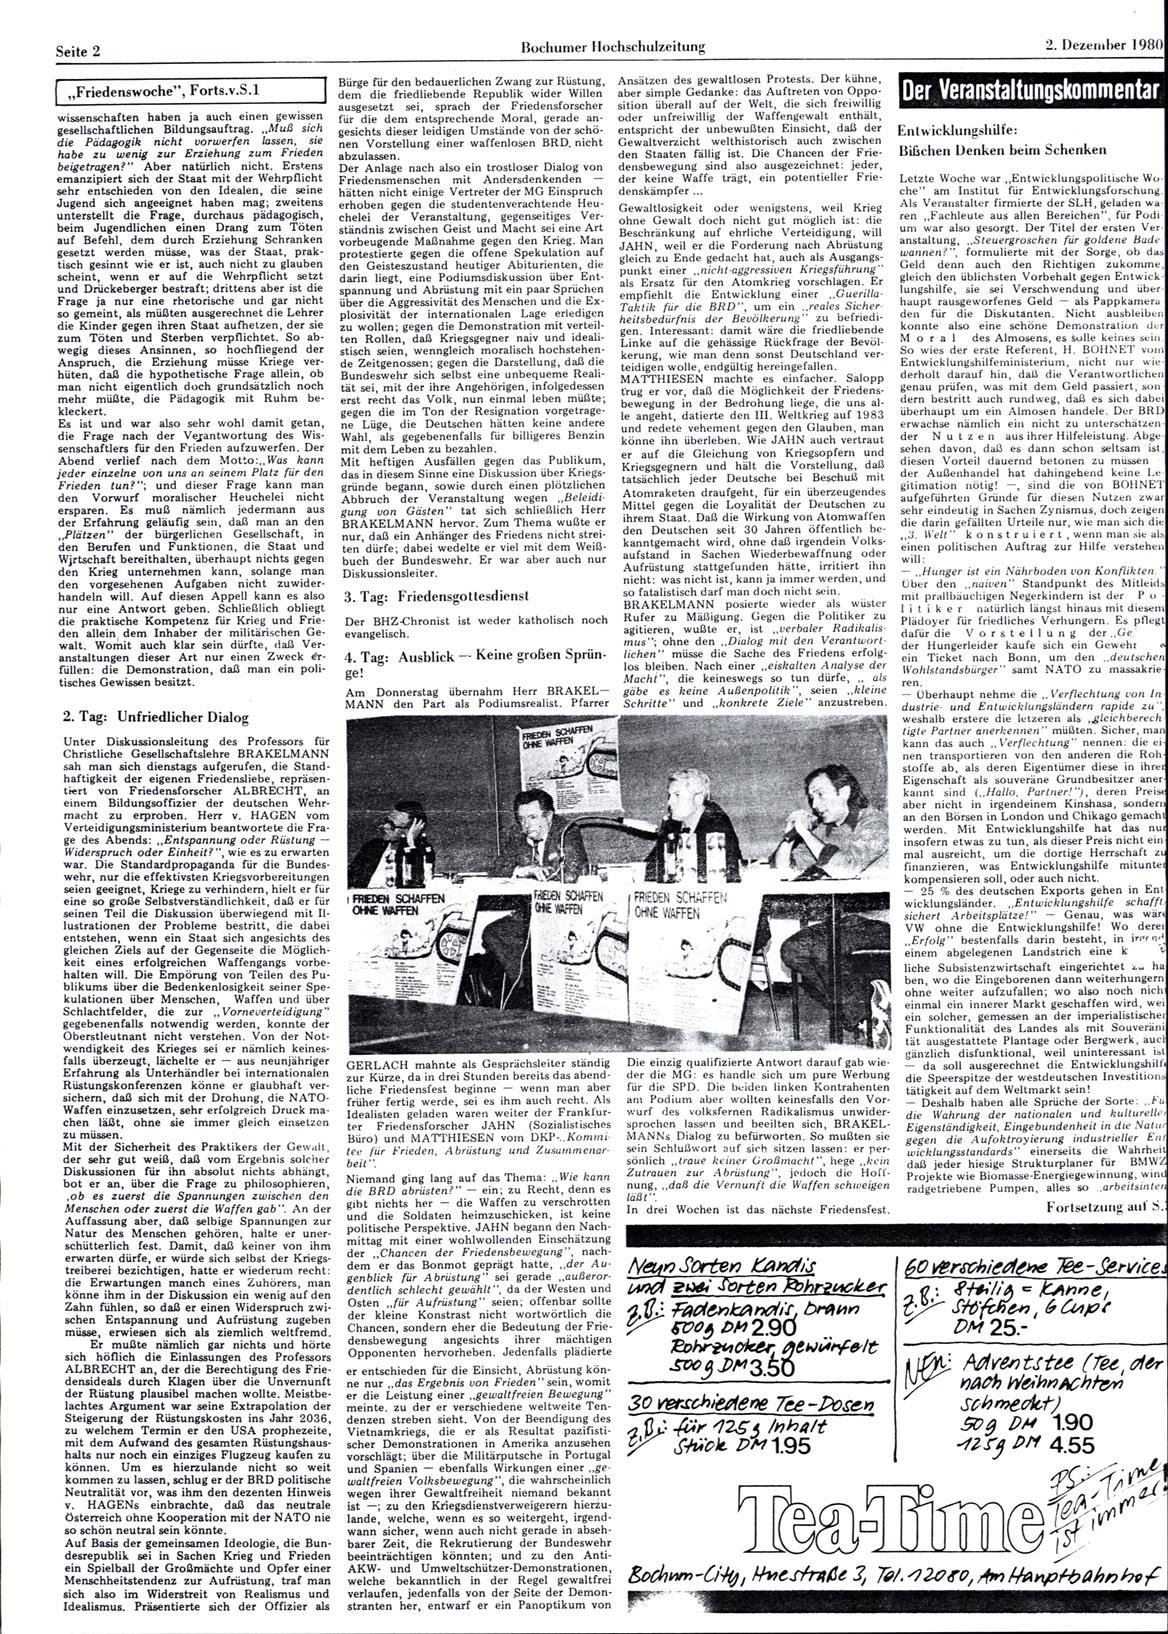 Bochum_BHZ_19801202_023_002